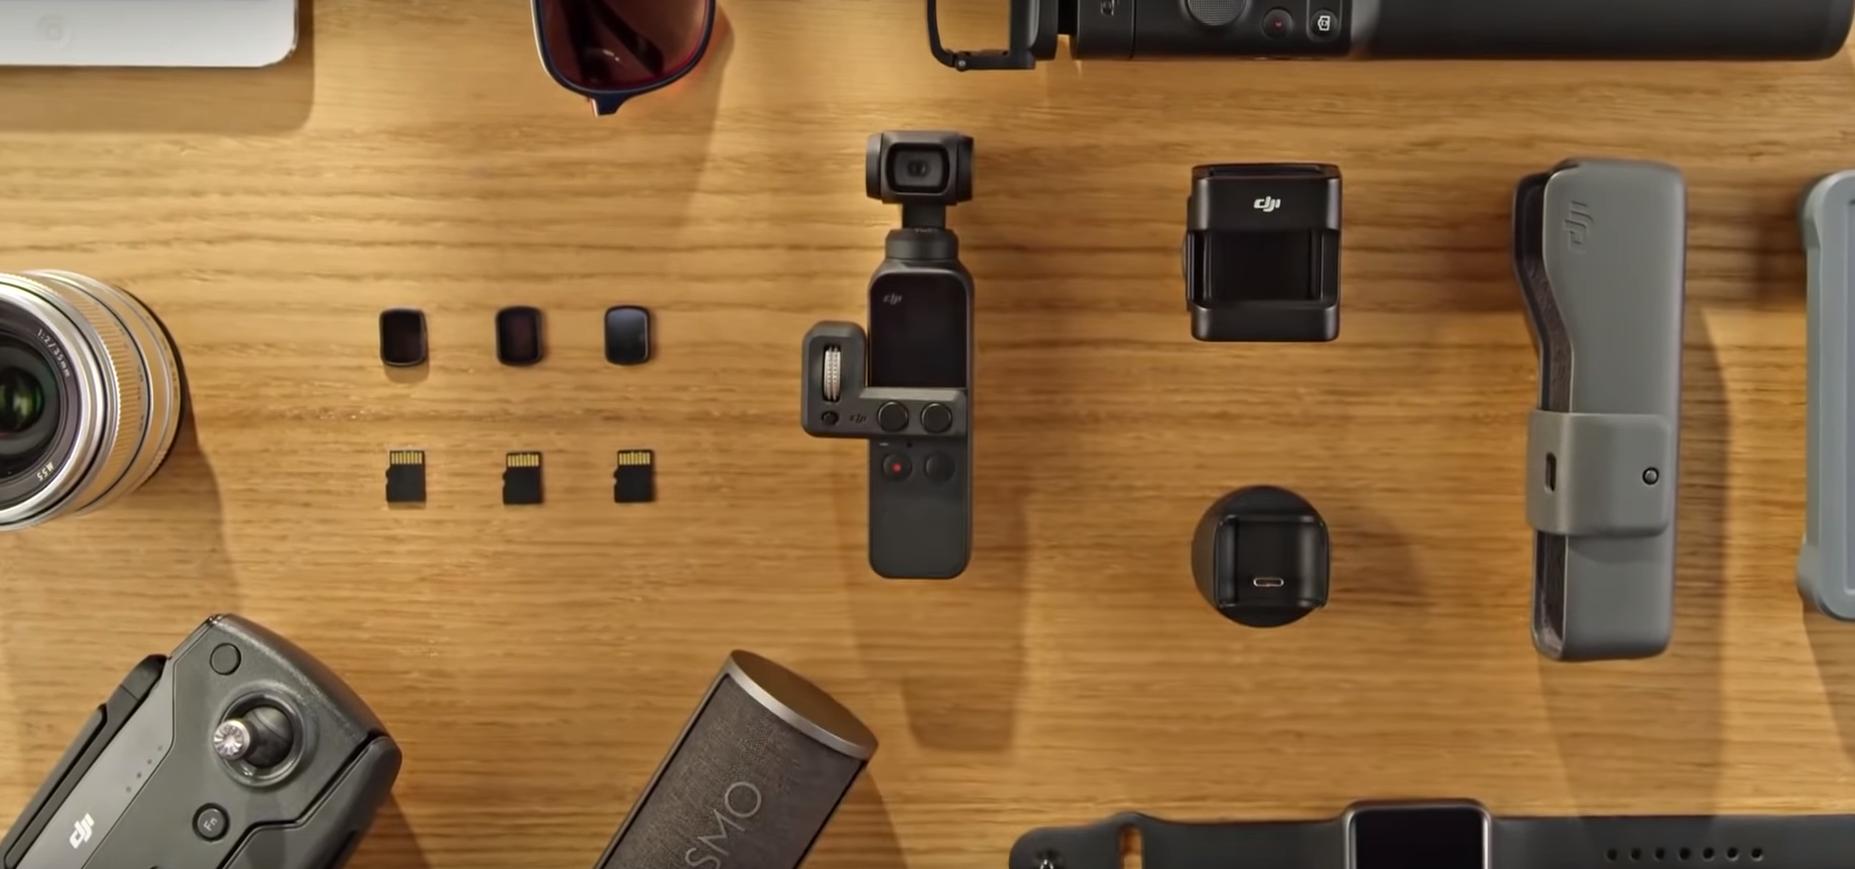 Обзор и сравнение DJI Osmo Pocket и Xiaomi FIMI PALM